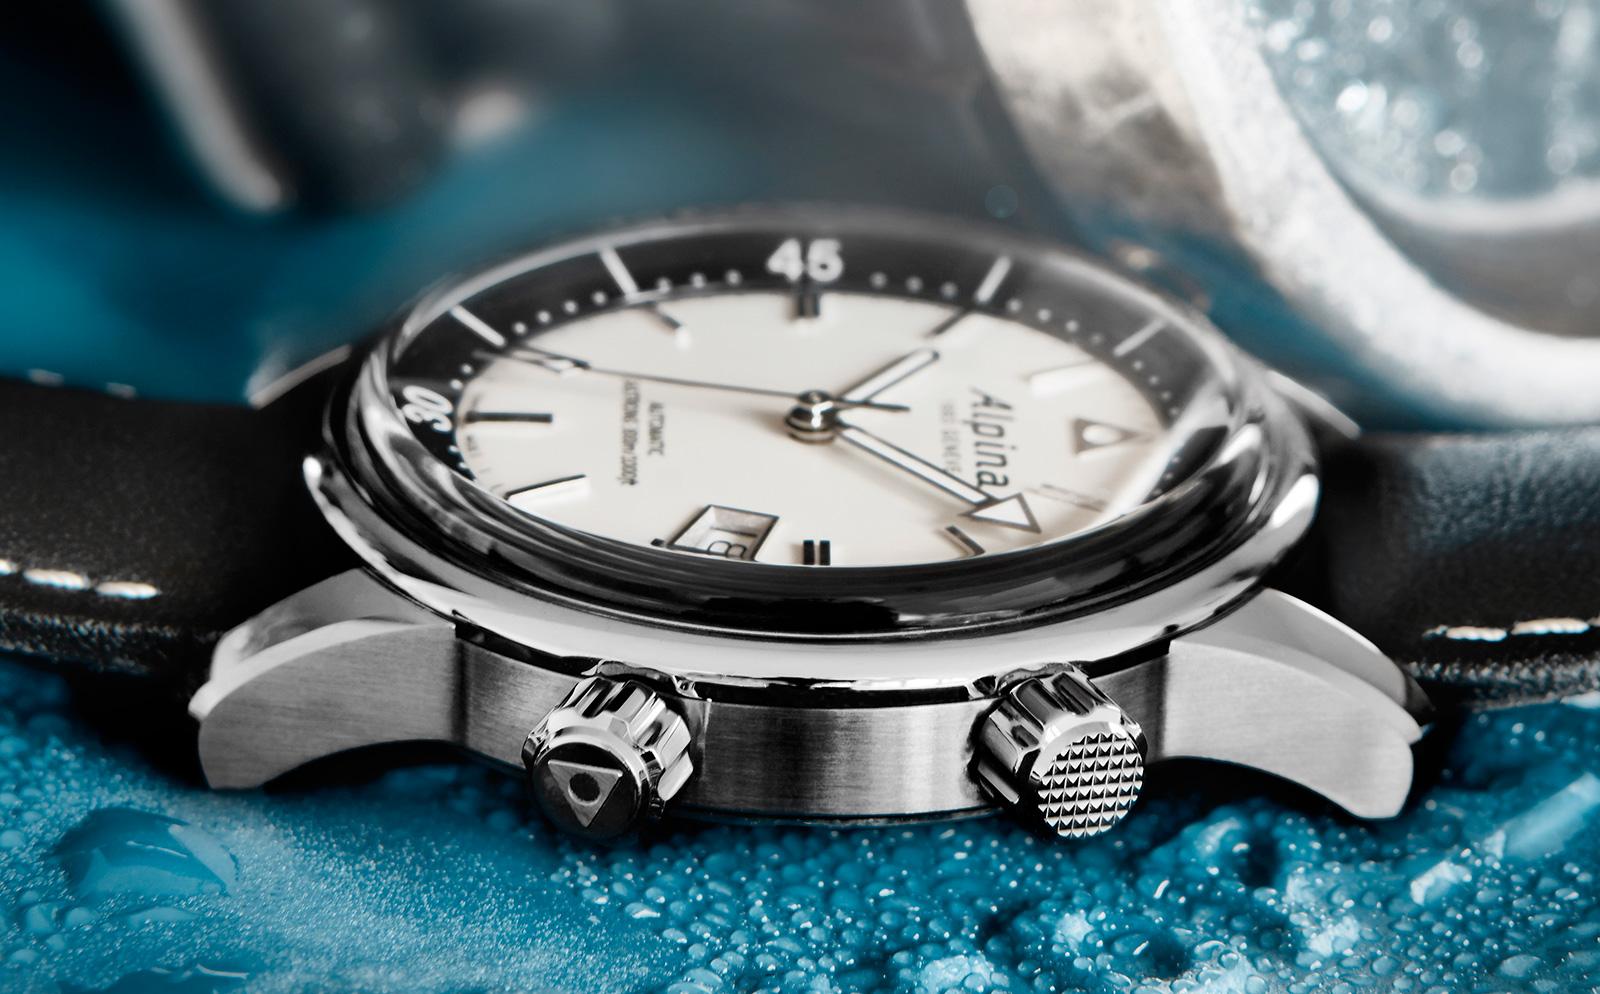 Naziv: Alpina-Seastrong-Diver-Heritage-3.jpg, pregleda: 247, veličina: 441,9 KB